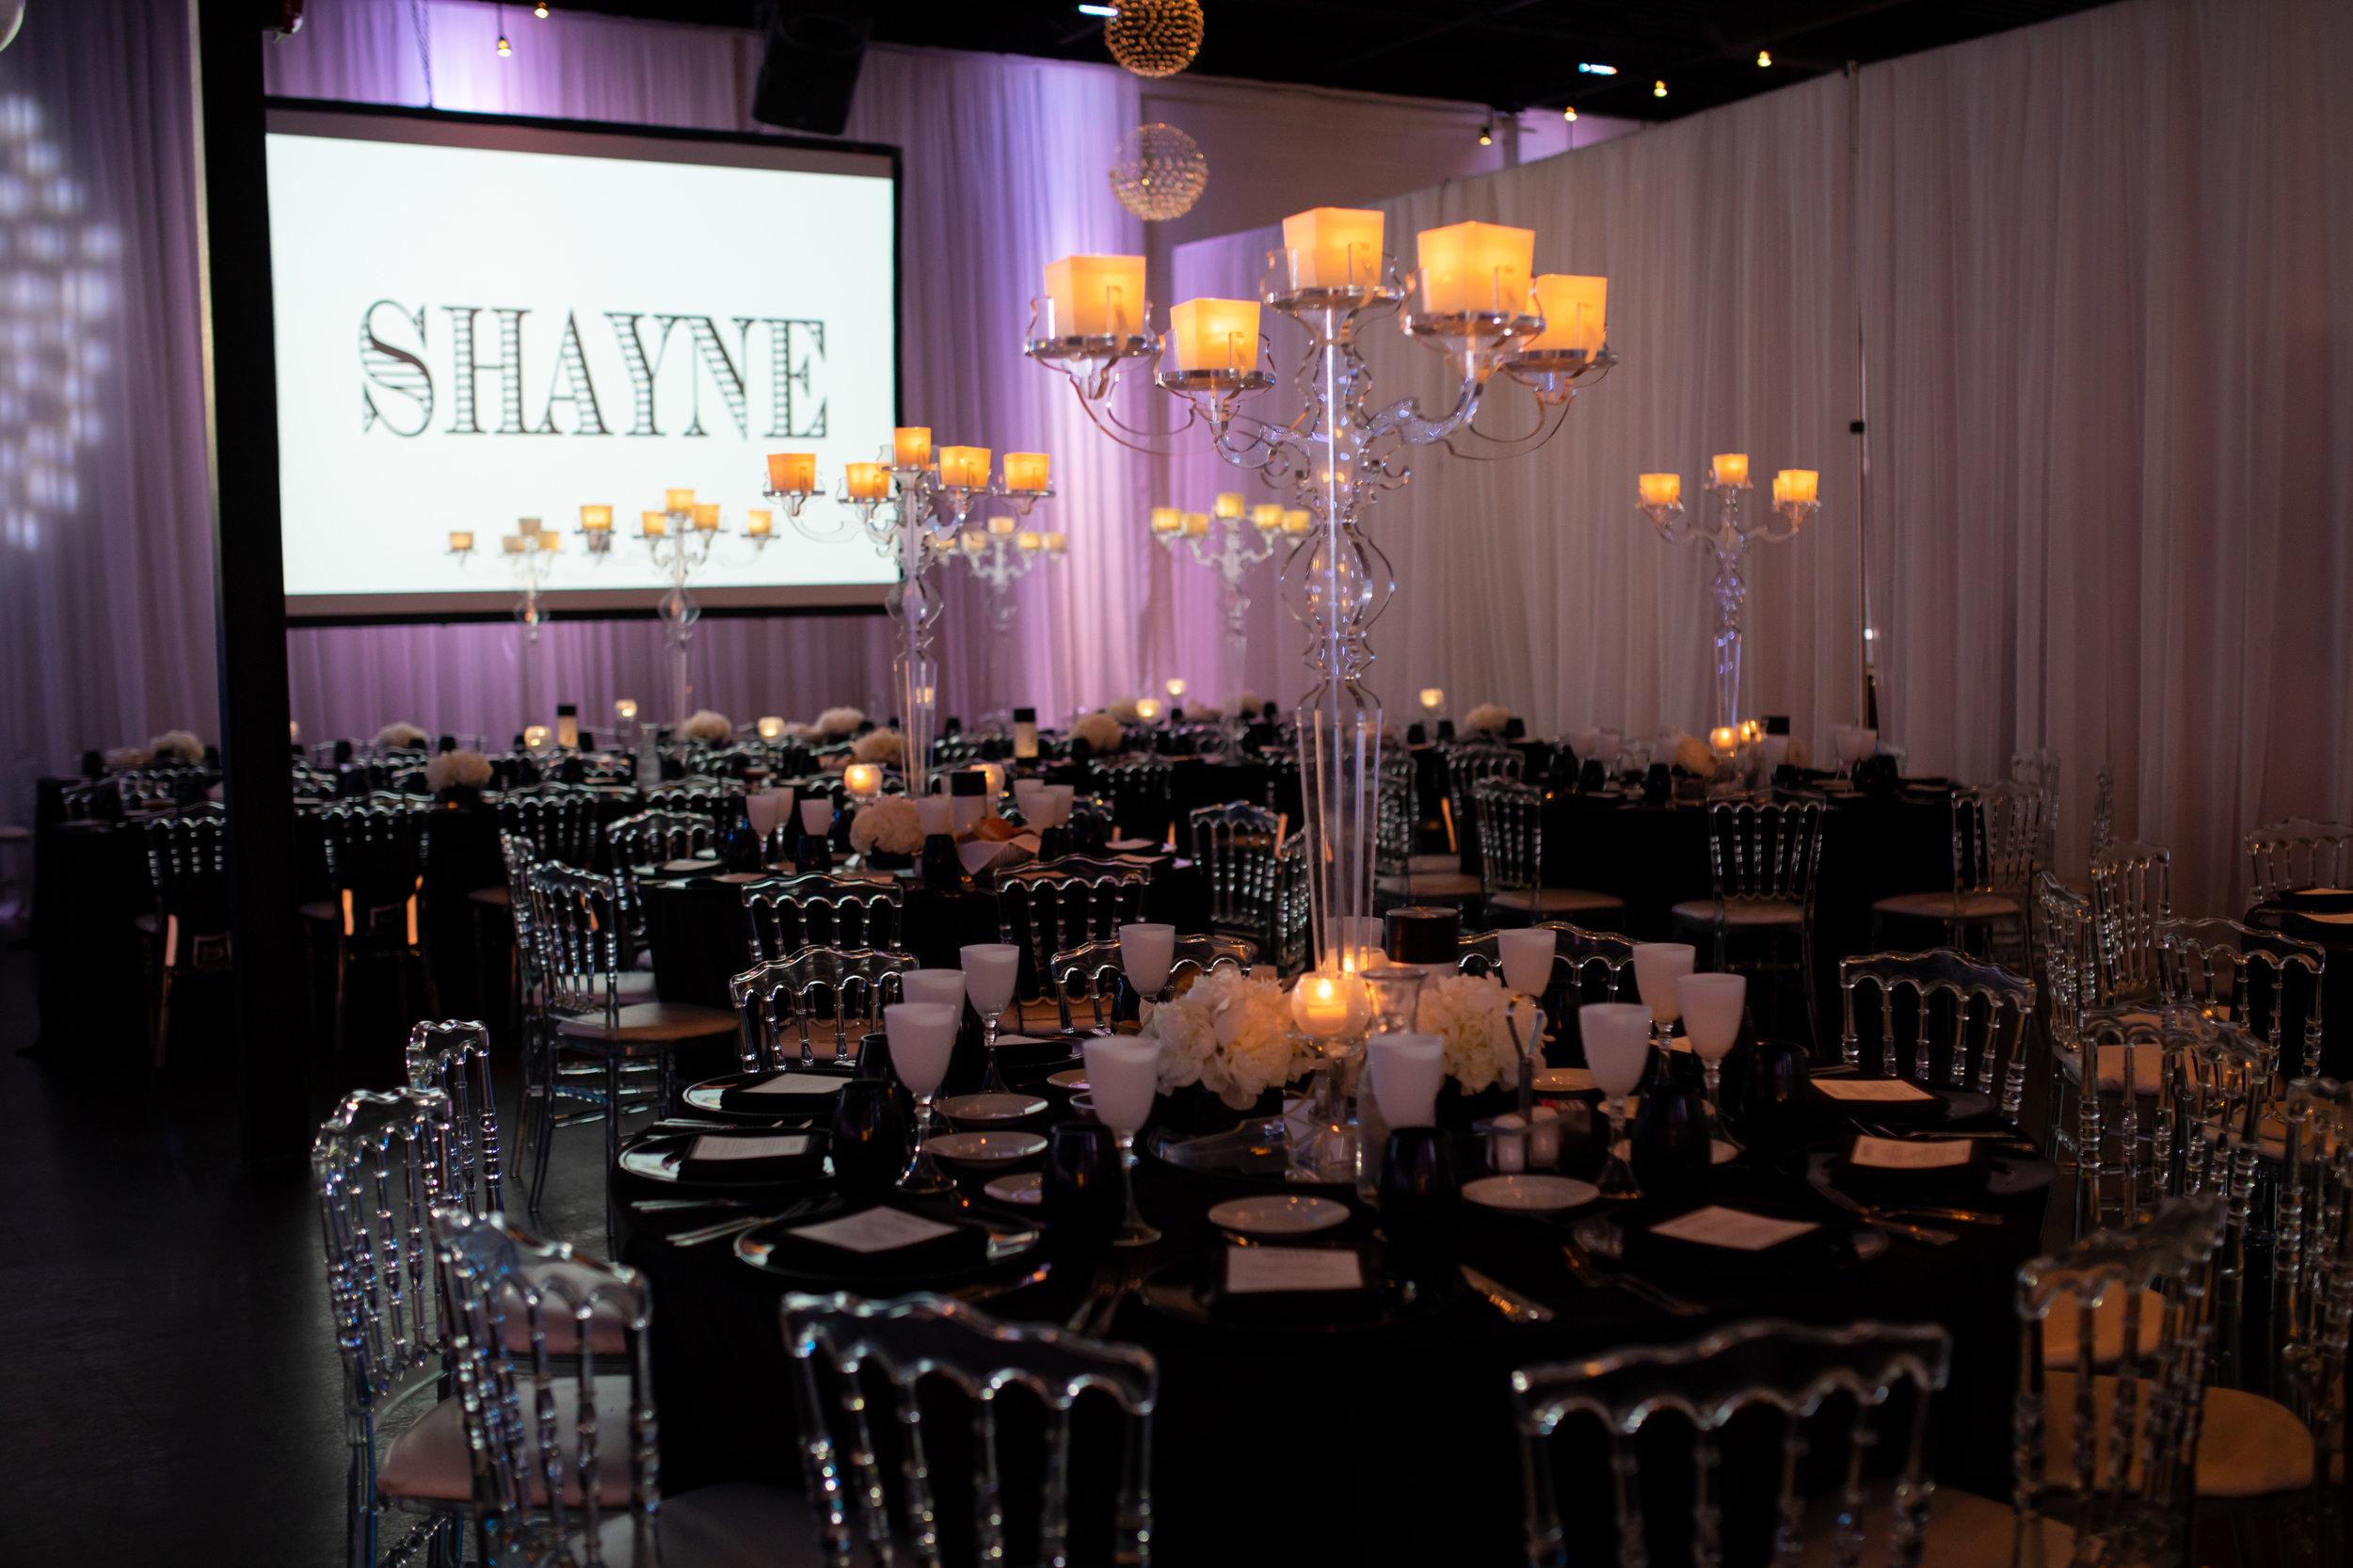 Shayne - Party-0357.jpg